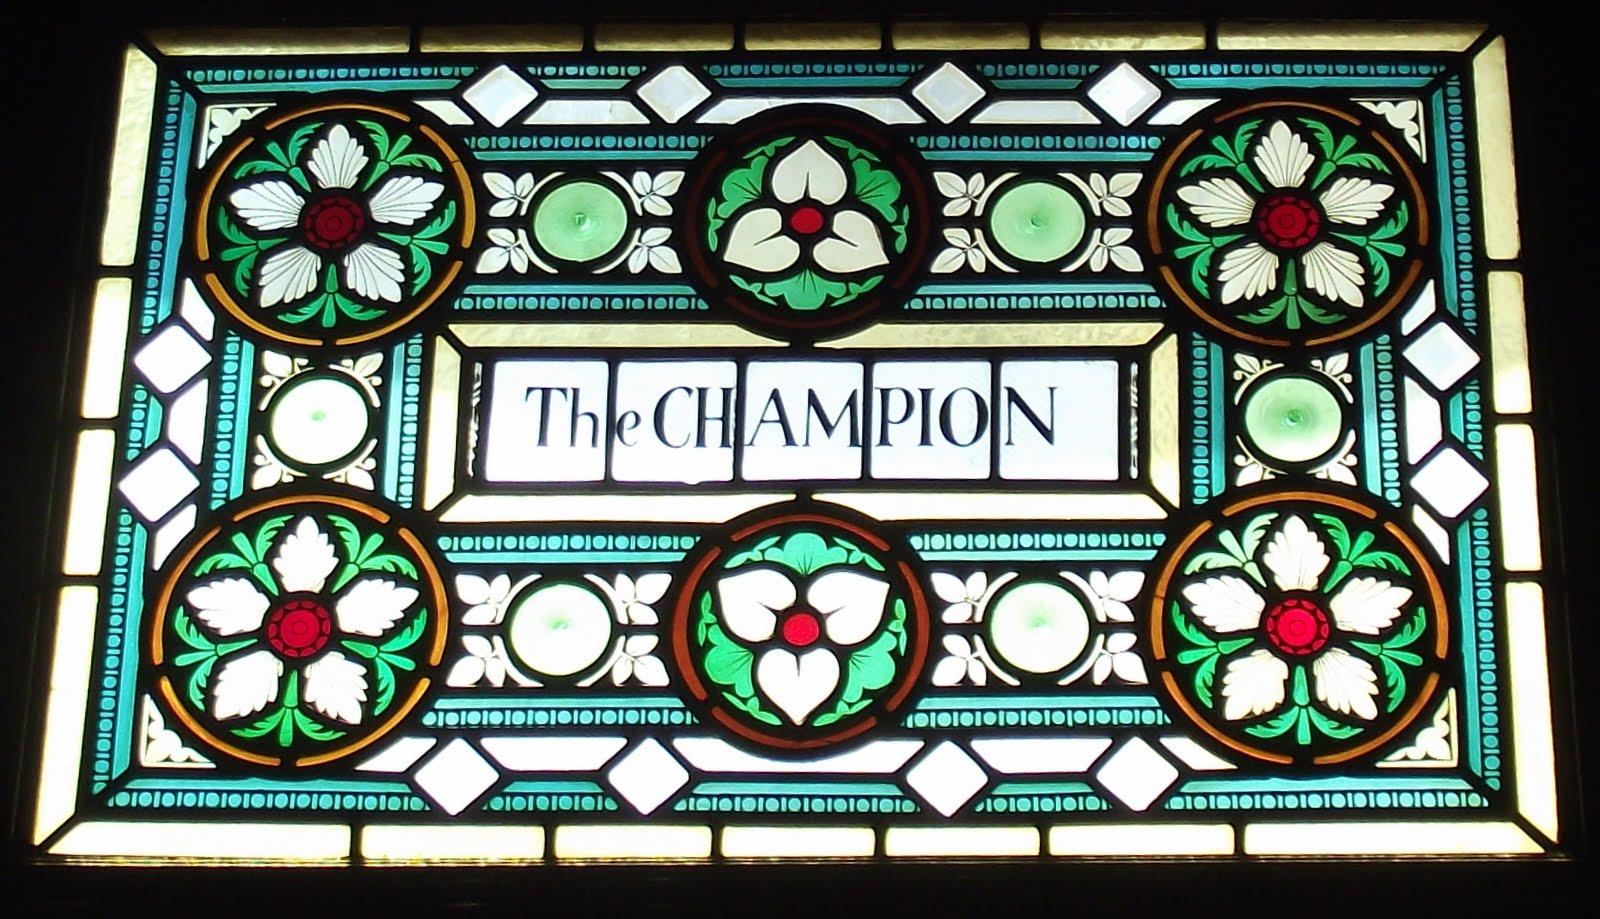 The Champion Pub